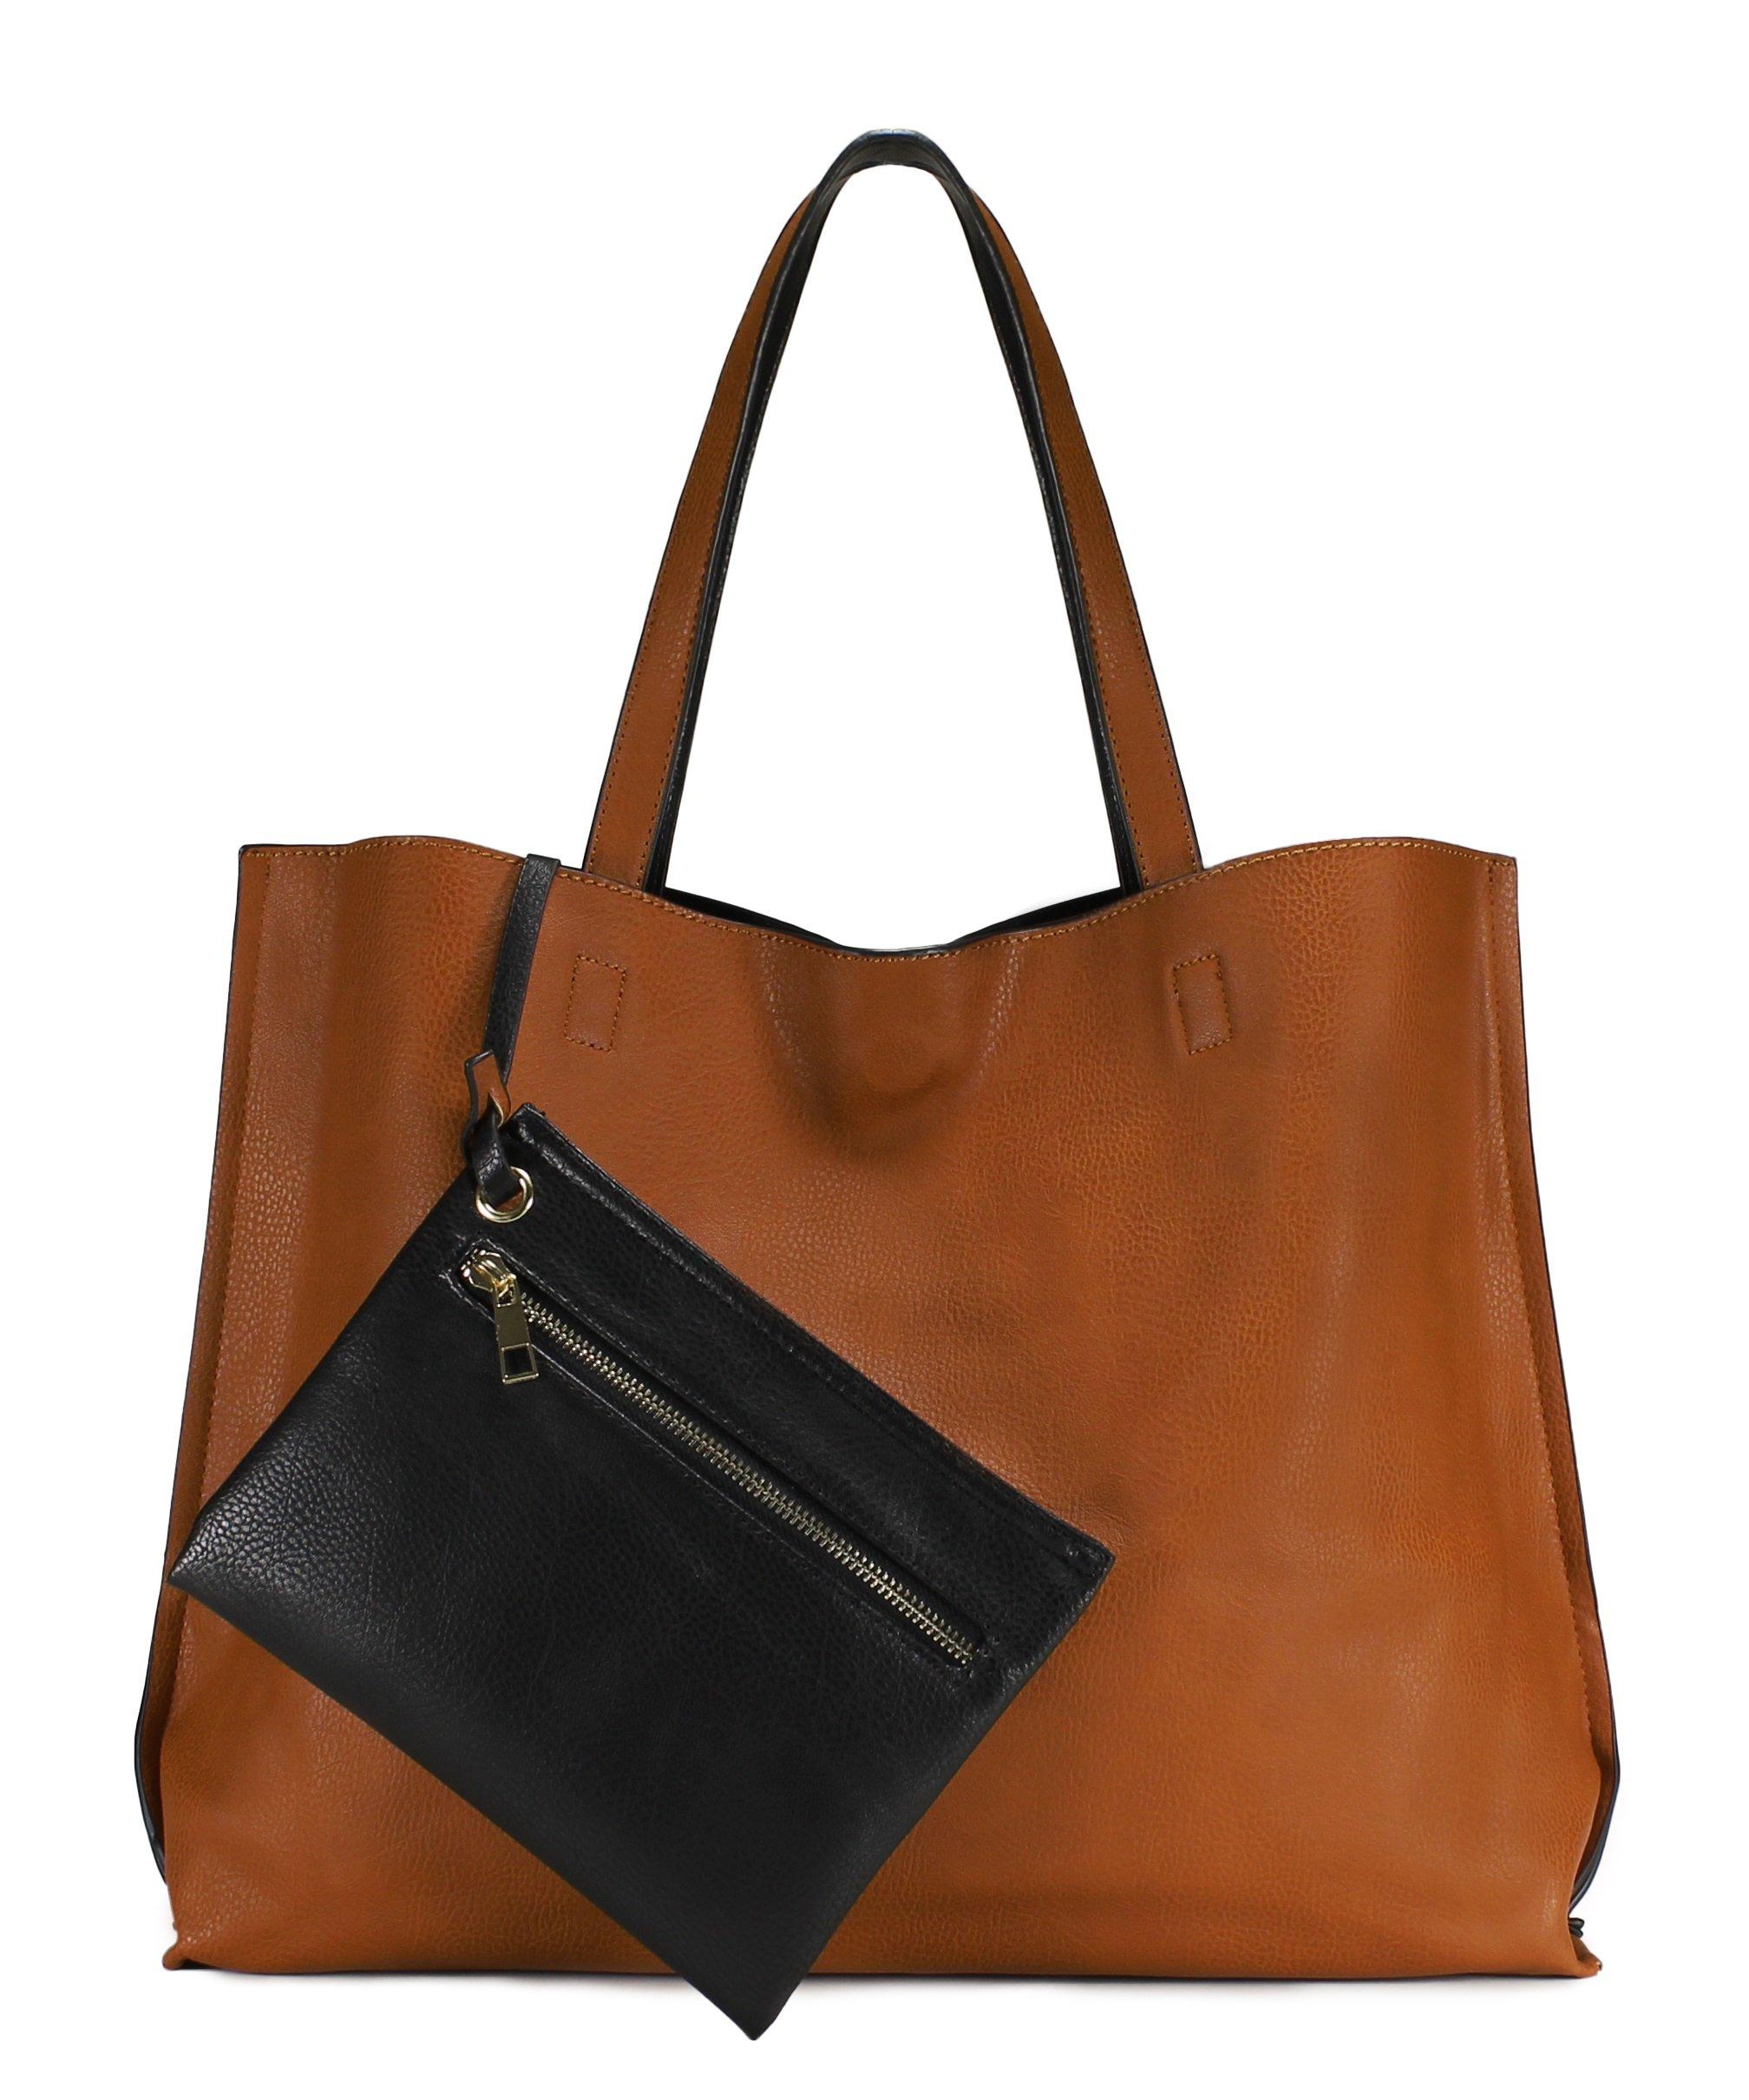 Scarleton Stylish Reversible Tote Bag H18422501 - Camel/Black